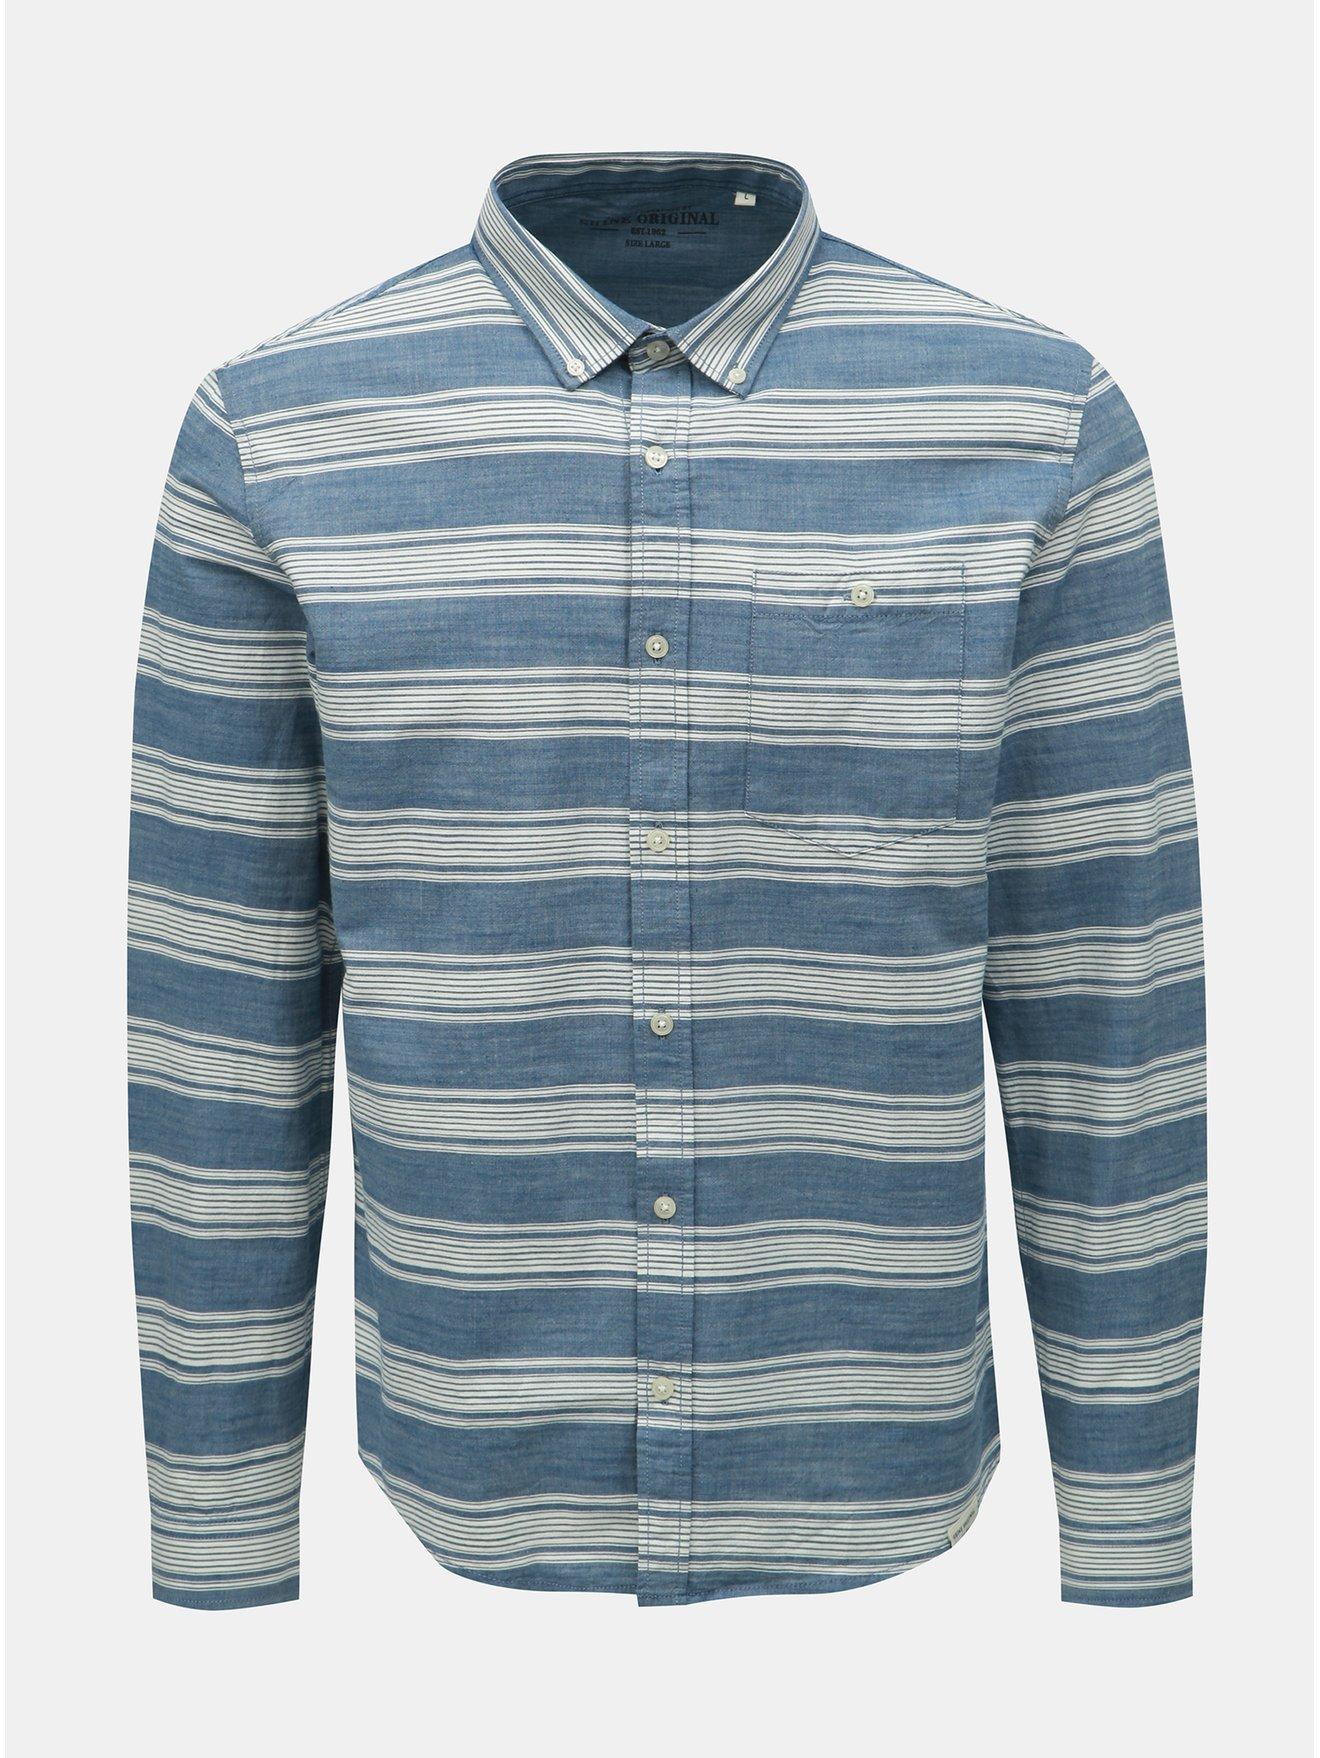 Bílo-modrá pruhovaná košile Shine Original